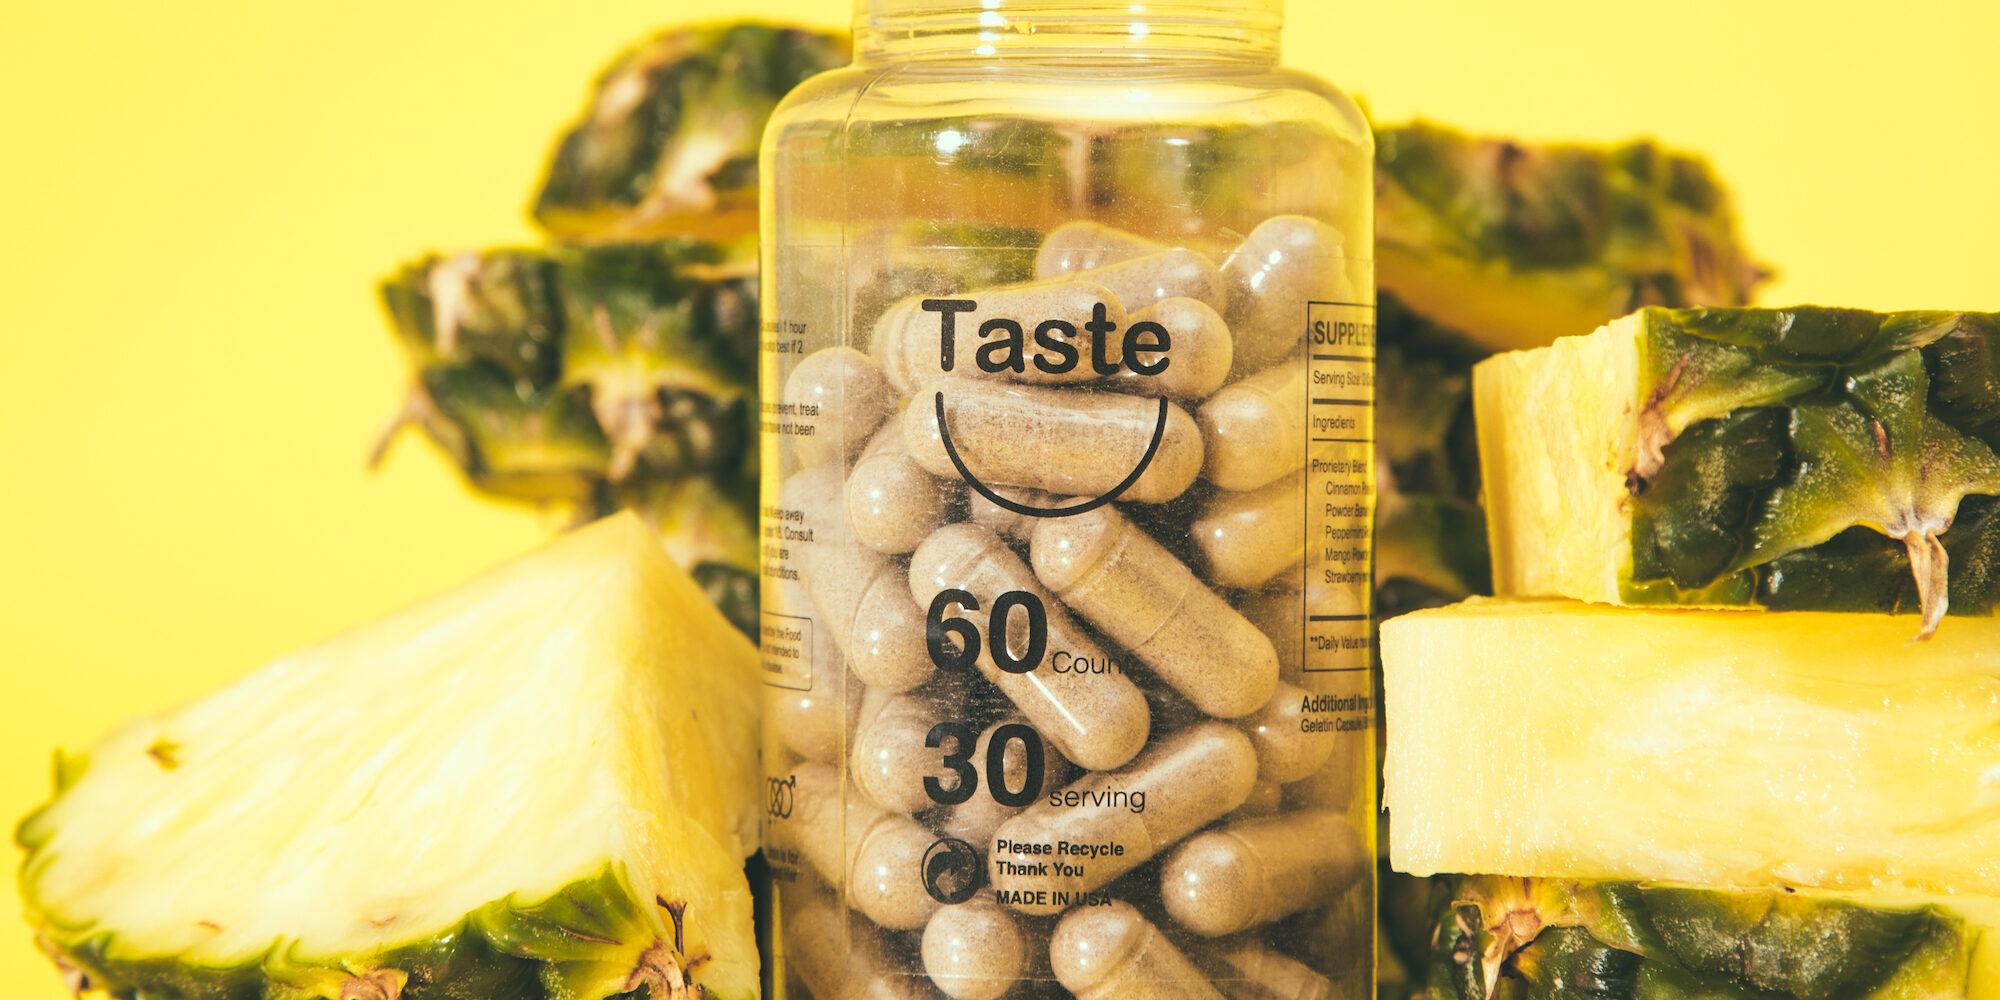 Entrepreneur Brittney Turner Takes On Sexual Wellness With New Venture Taste Vitamin